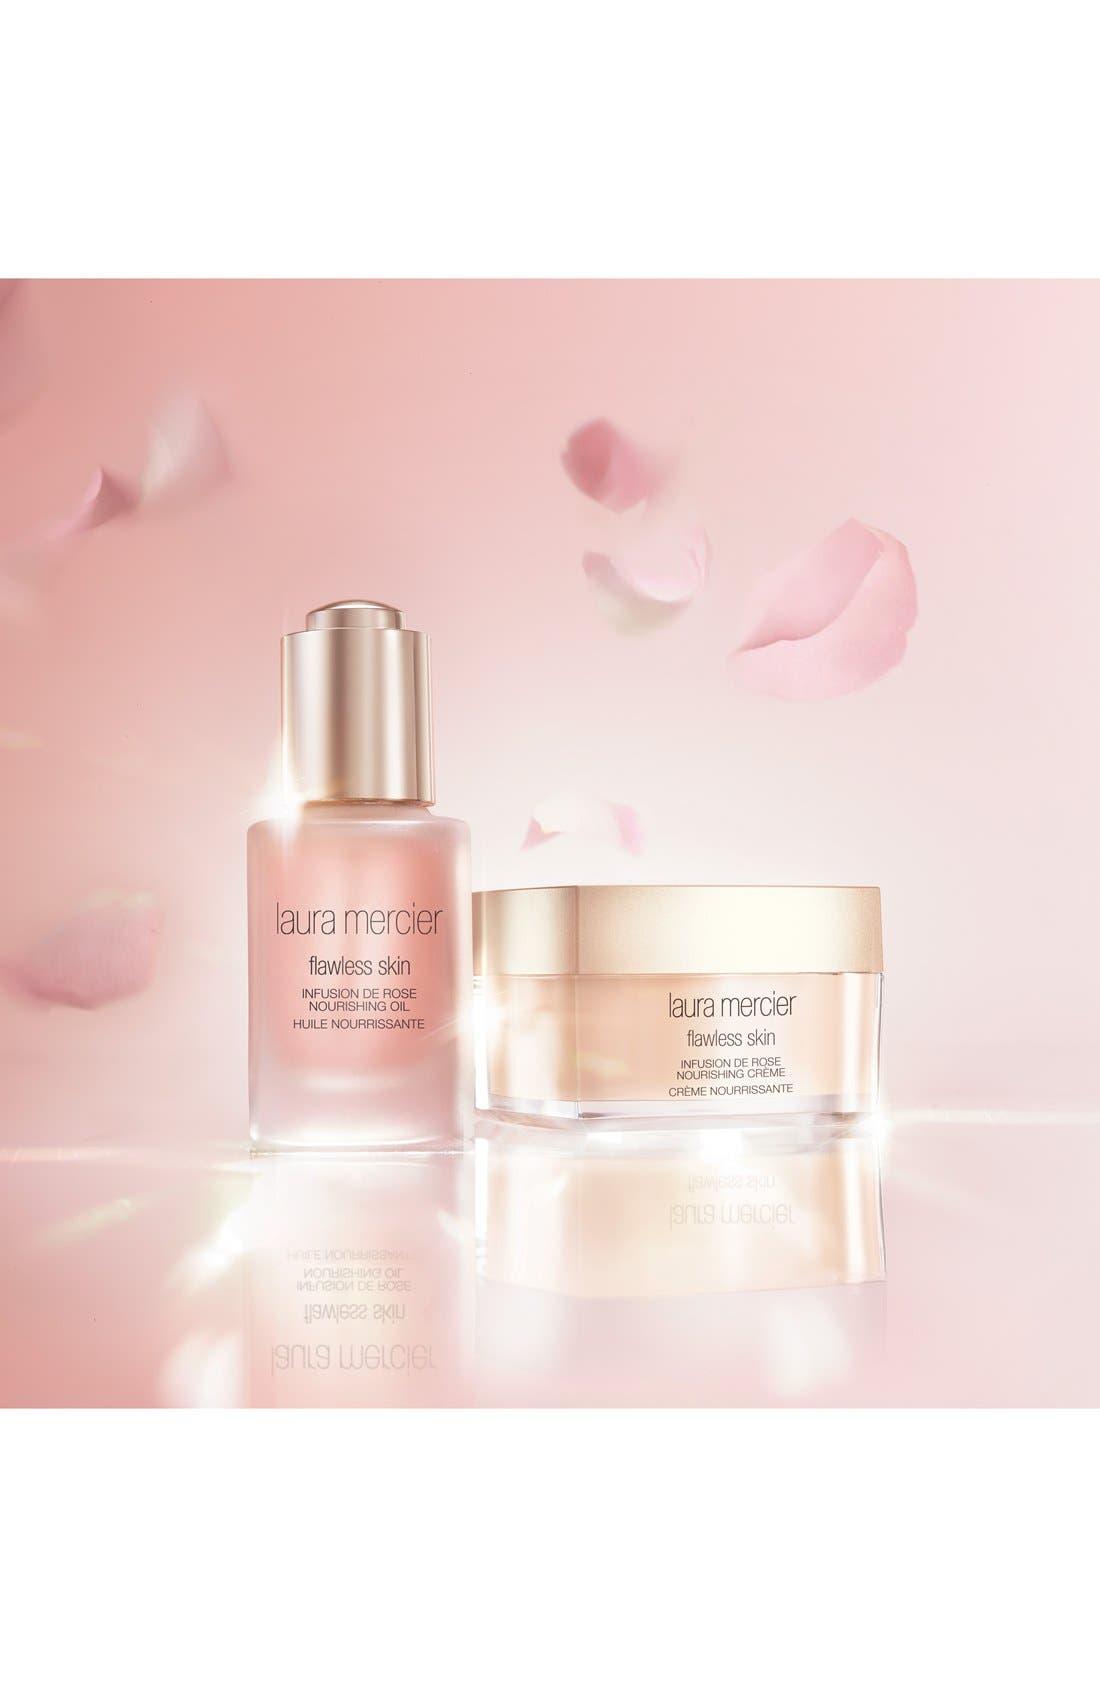 LAURA MERCIER, 'Flawless Skin' Infusion de Rose Nourishing Oil, Alternate thumbnail 2, color, NO COLOR